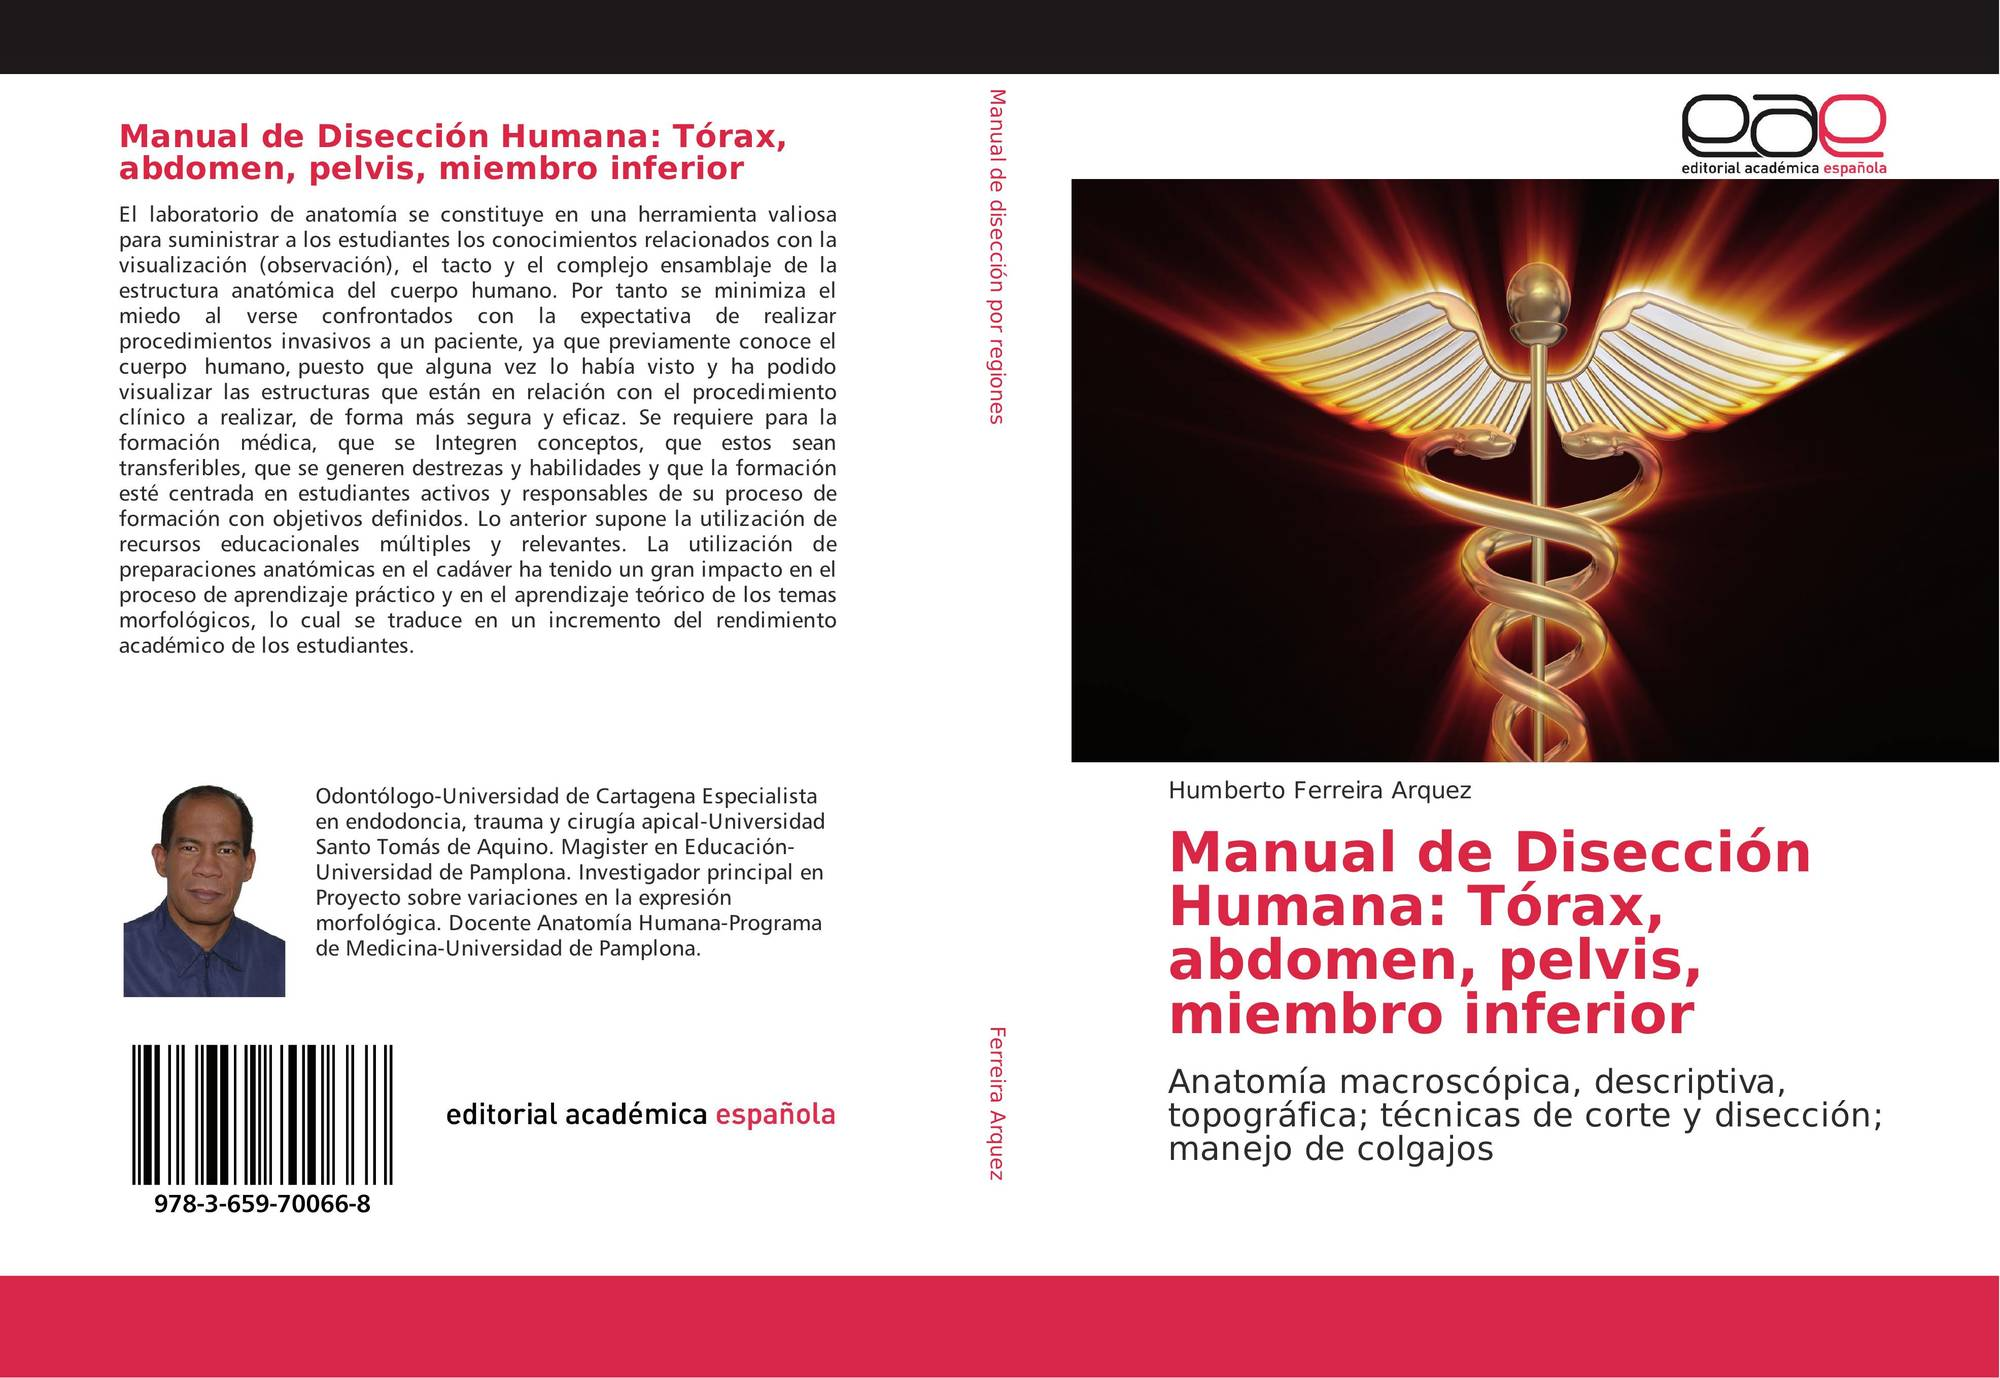 Manual de Disección Humana: Tórax, abdomen, pelvis, miembro inferior ...